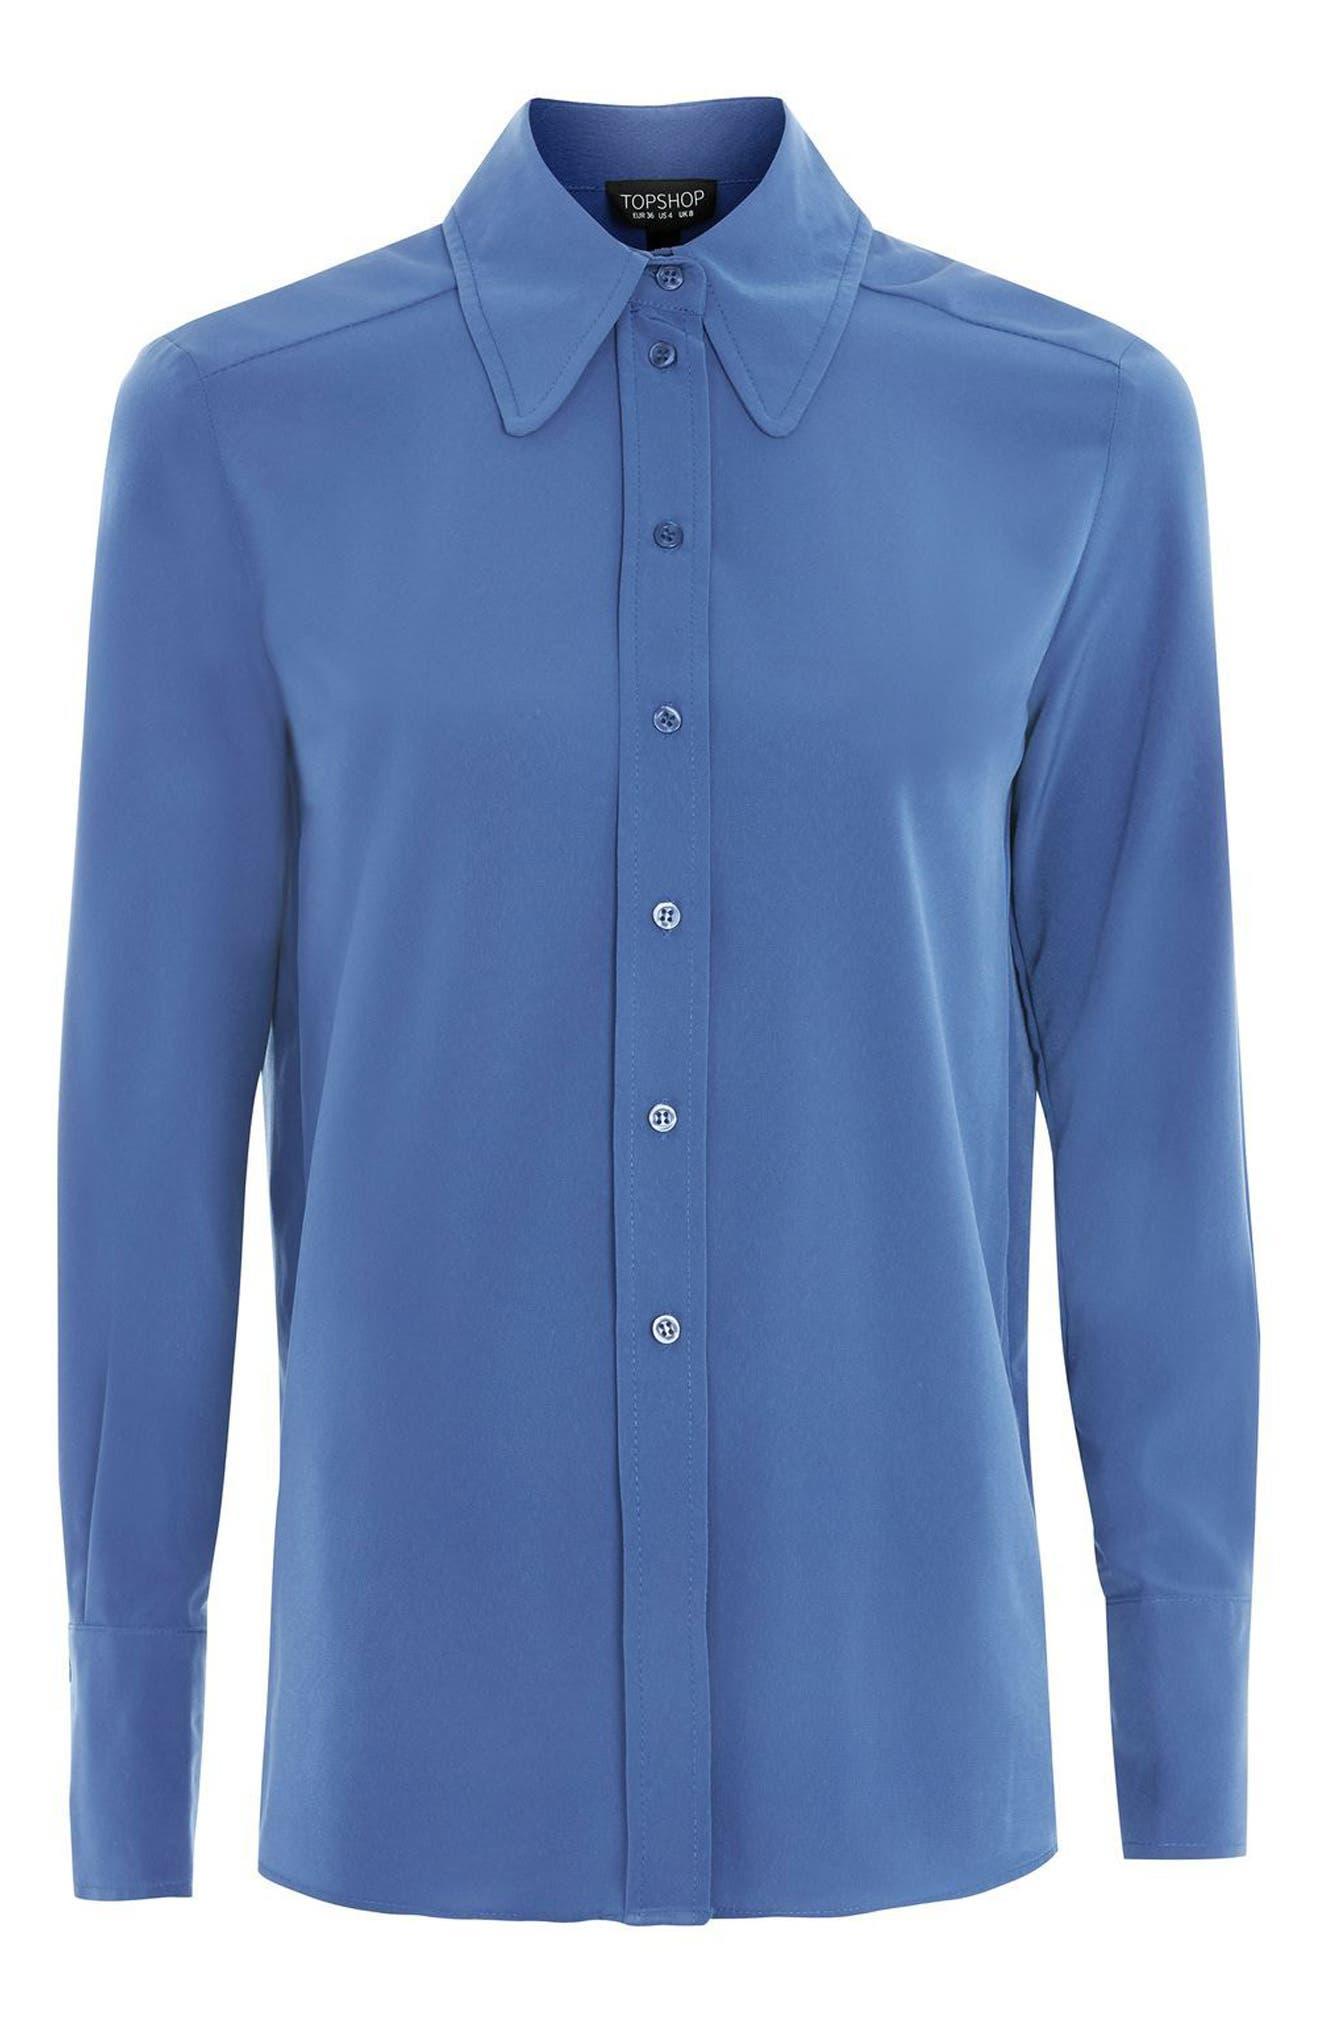 '70s Collar Shirt,                             Alternate thumbnail 4, color,                             400